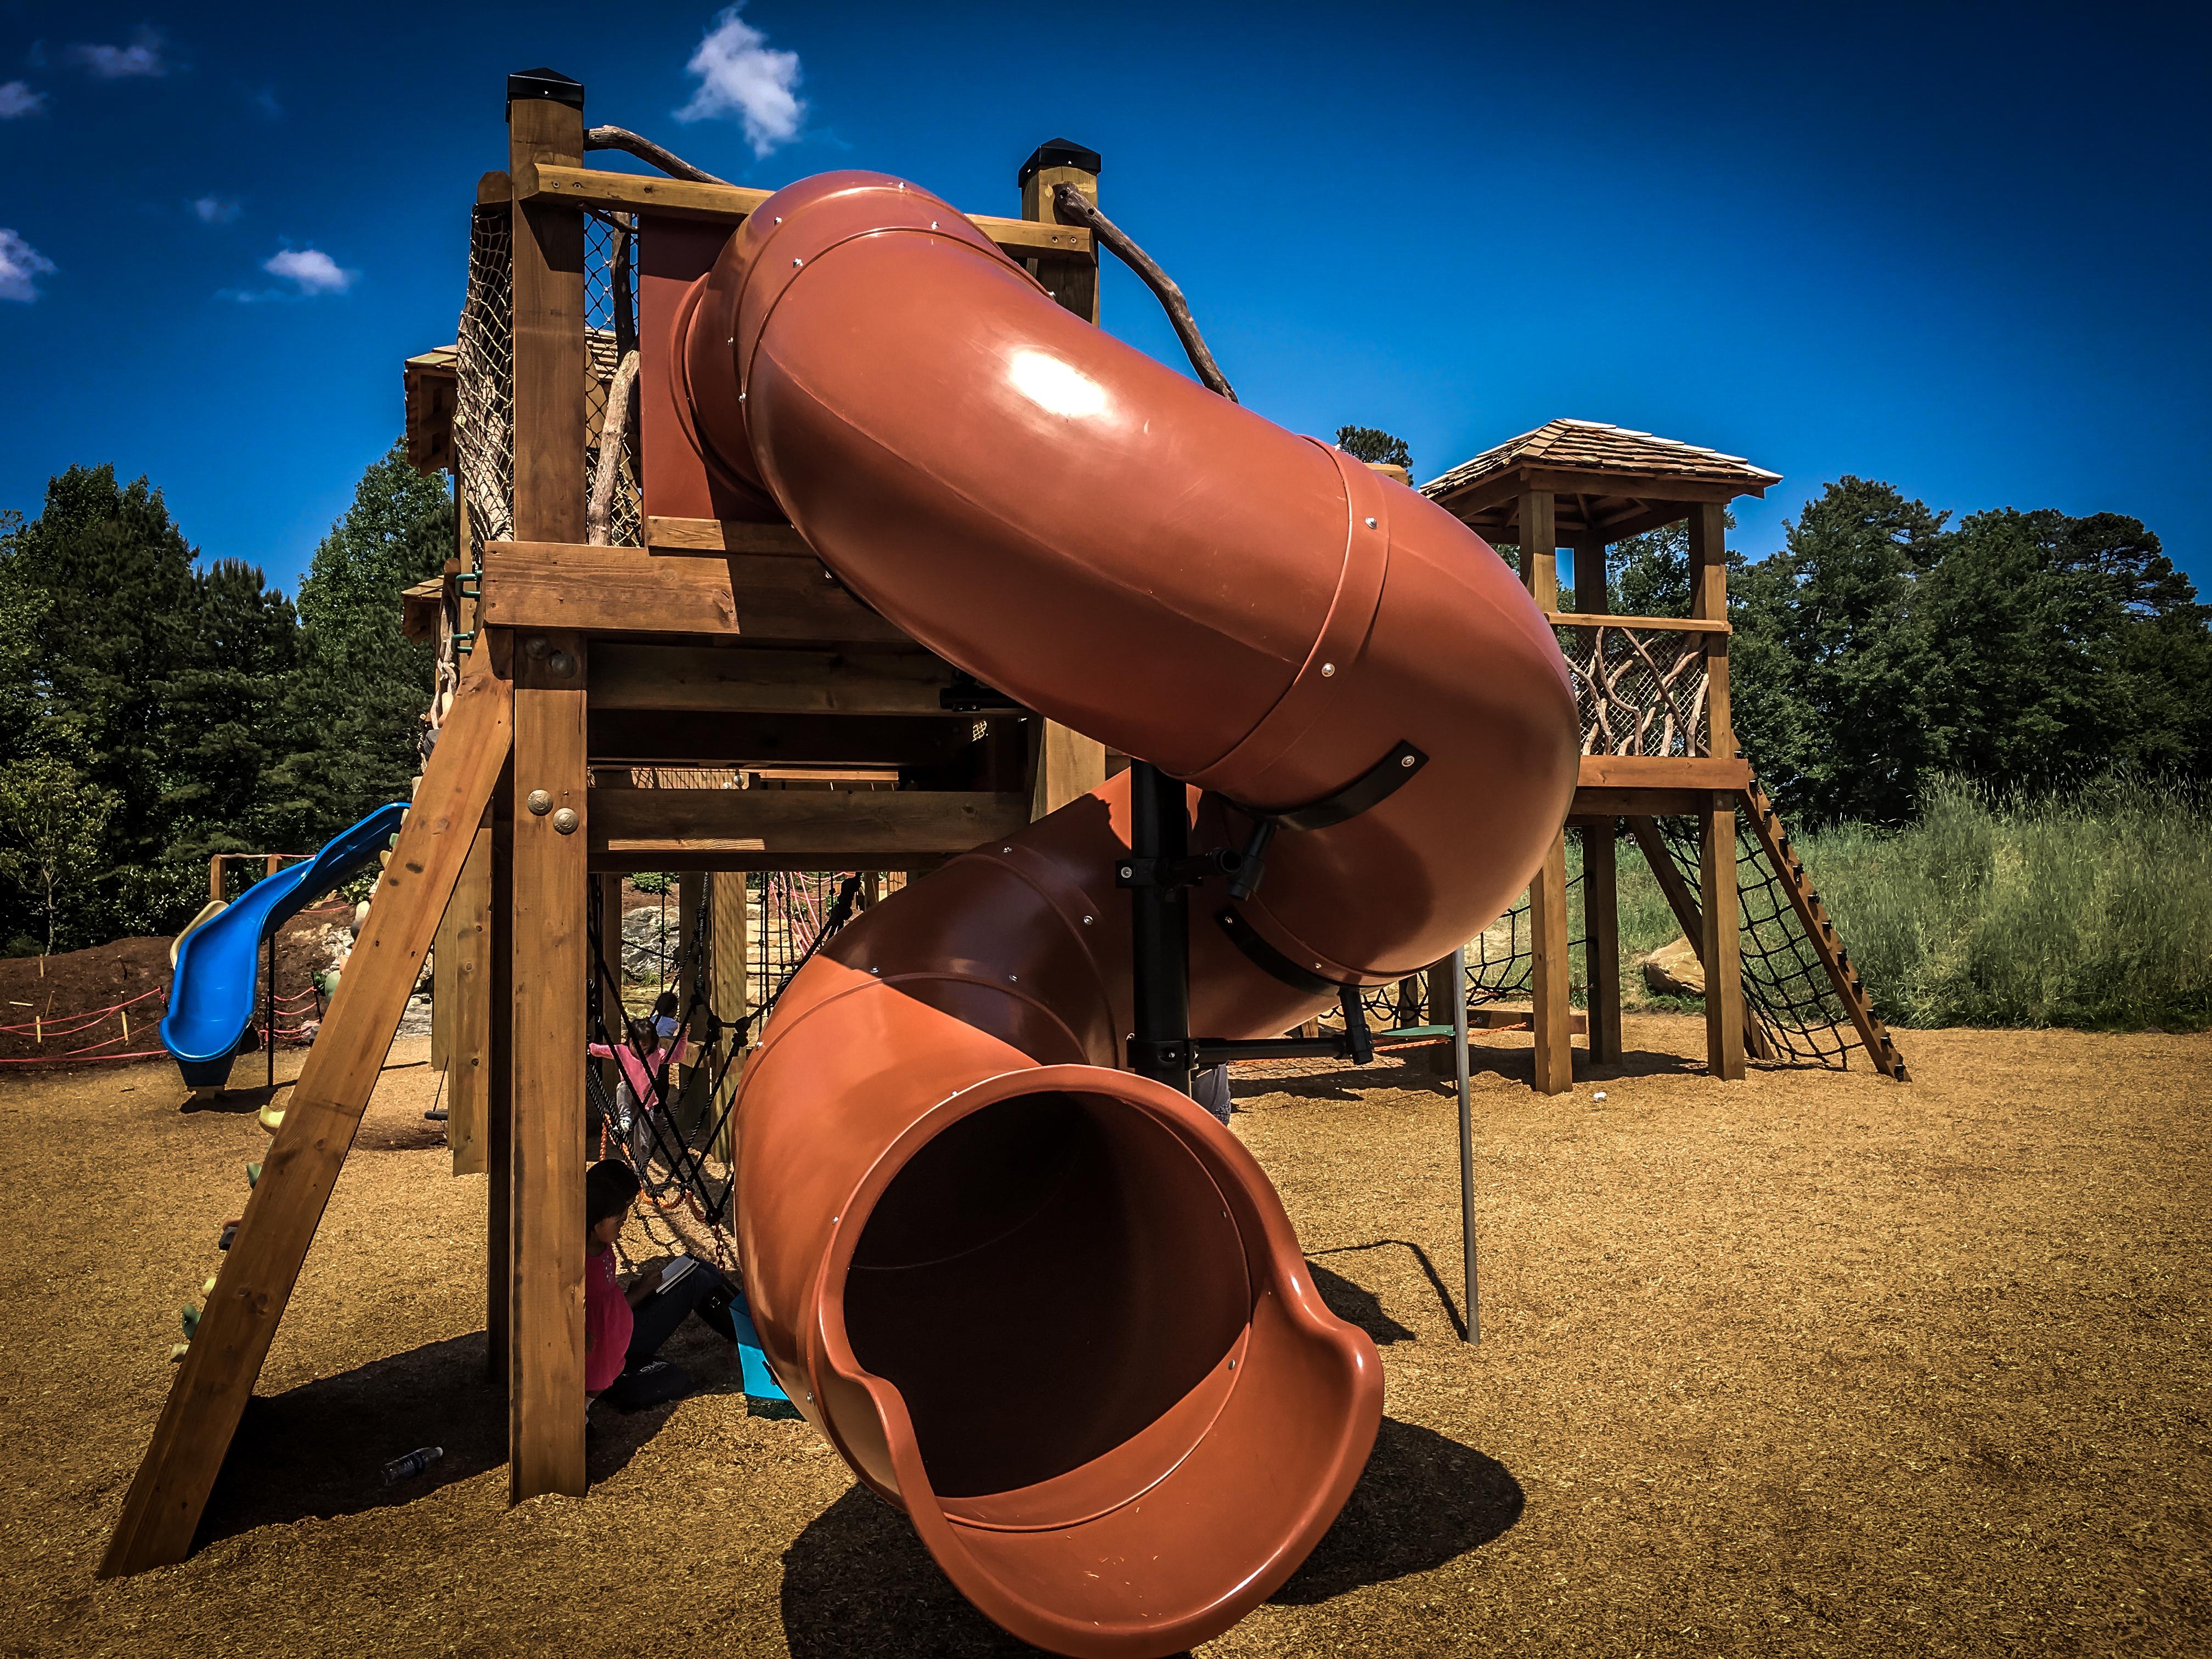 Flatrock Playground